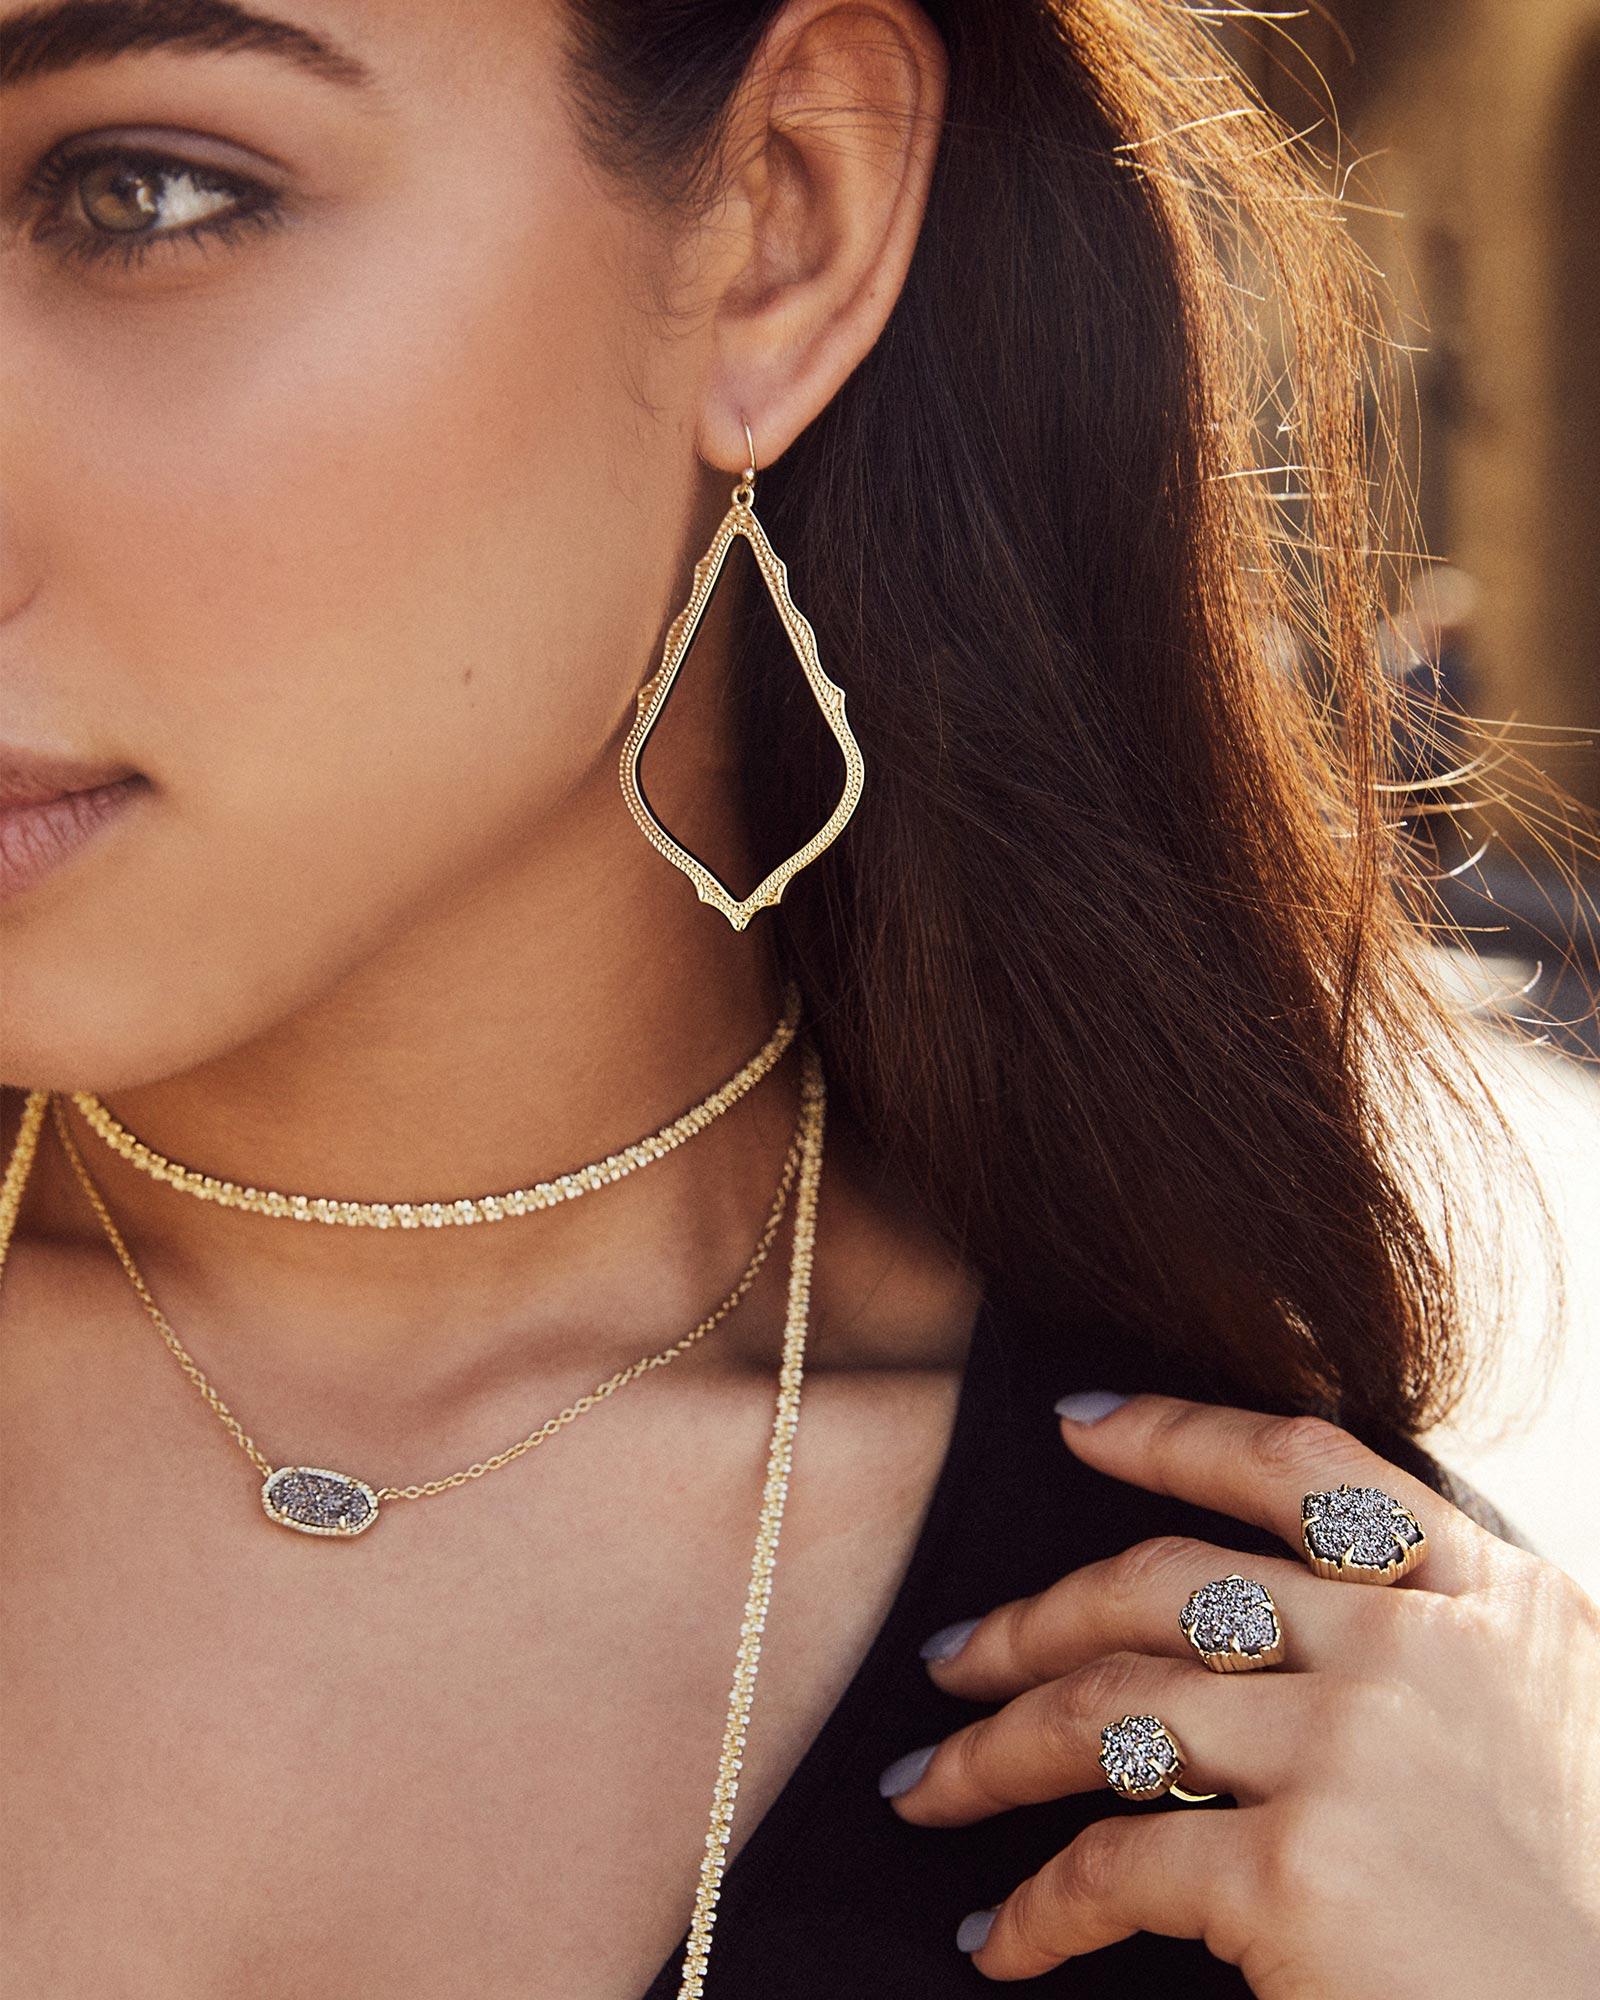 Naomi Double Ring Jewelry Kendra Scott